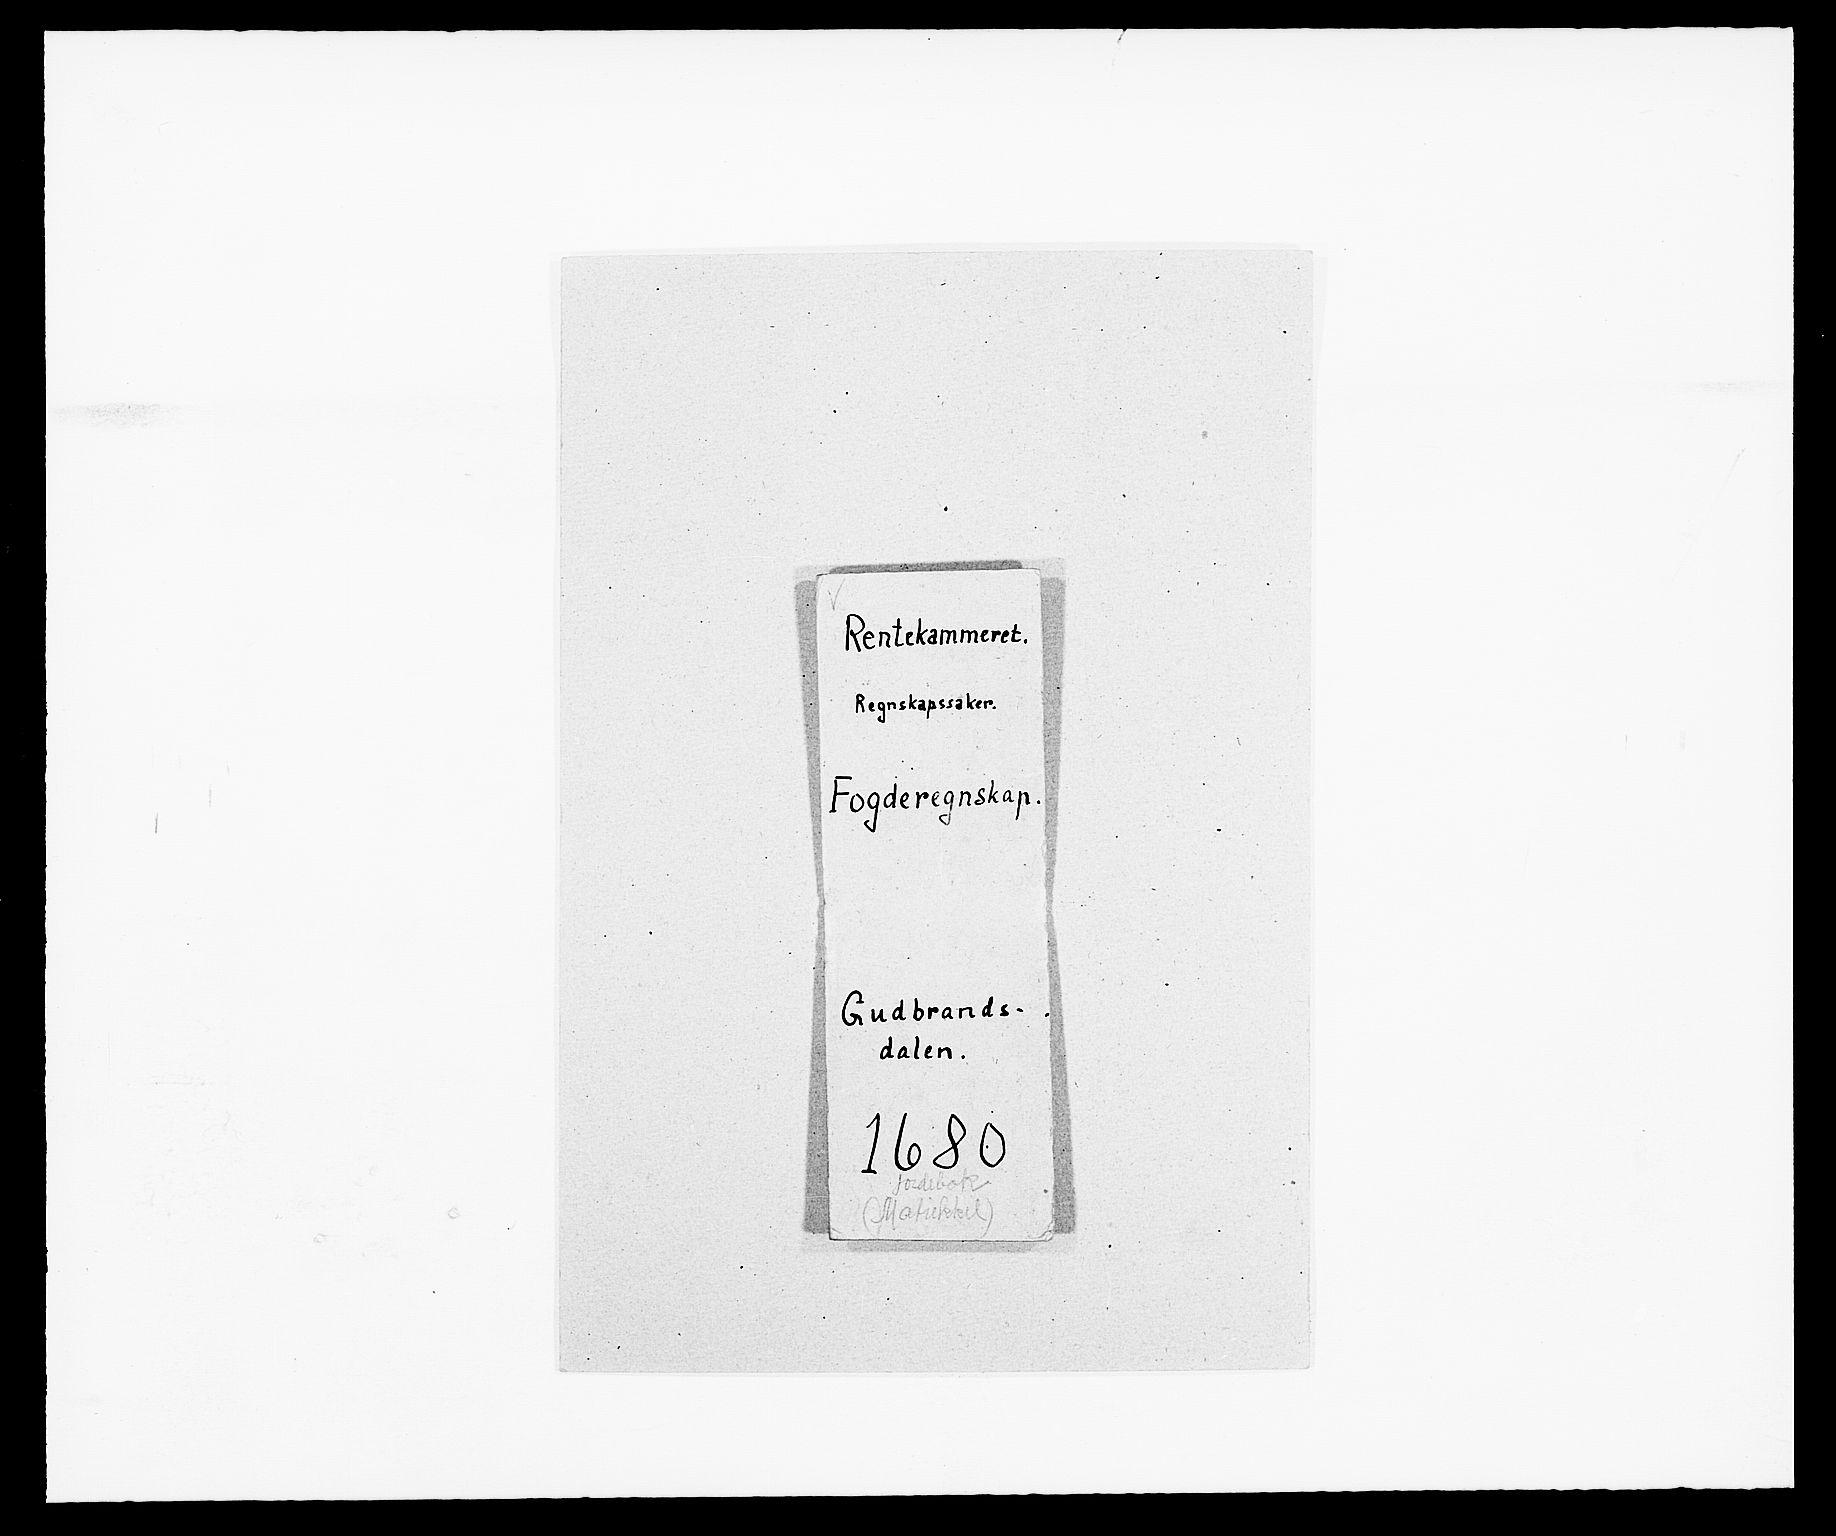 RA, Rentekammeret inntil 1814, Reviderte regnskaper, Fogderegnskap, R17/L1154: Fogderegnskap Gudbrandsdal, 1680, s. 1